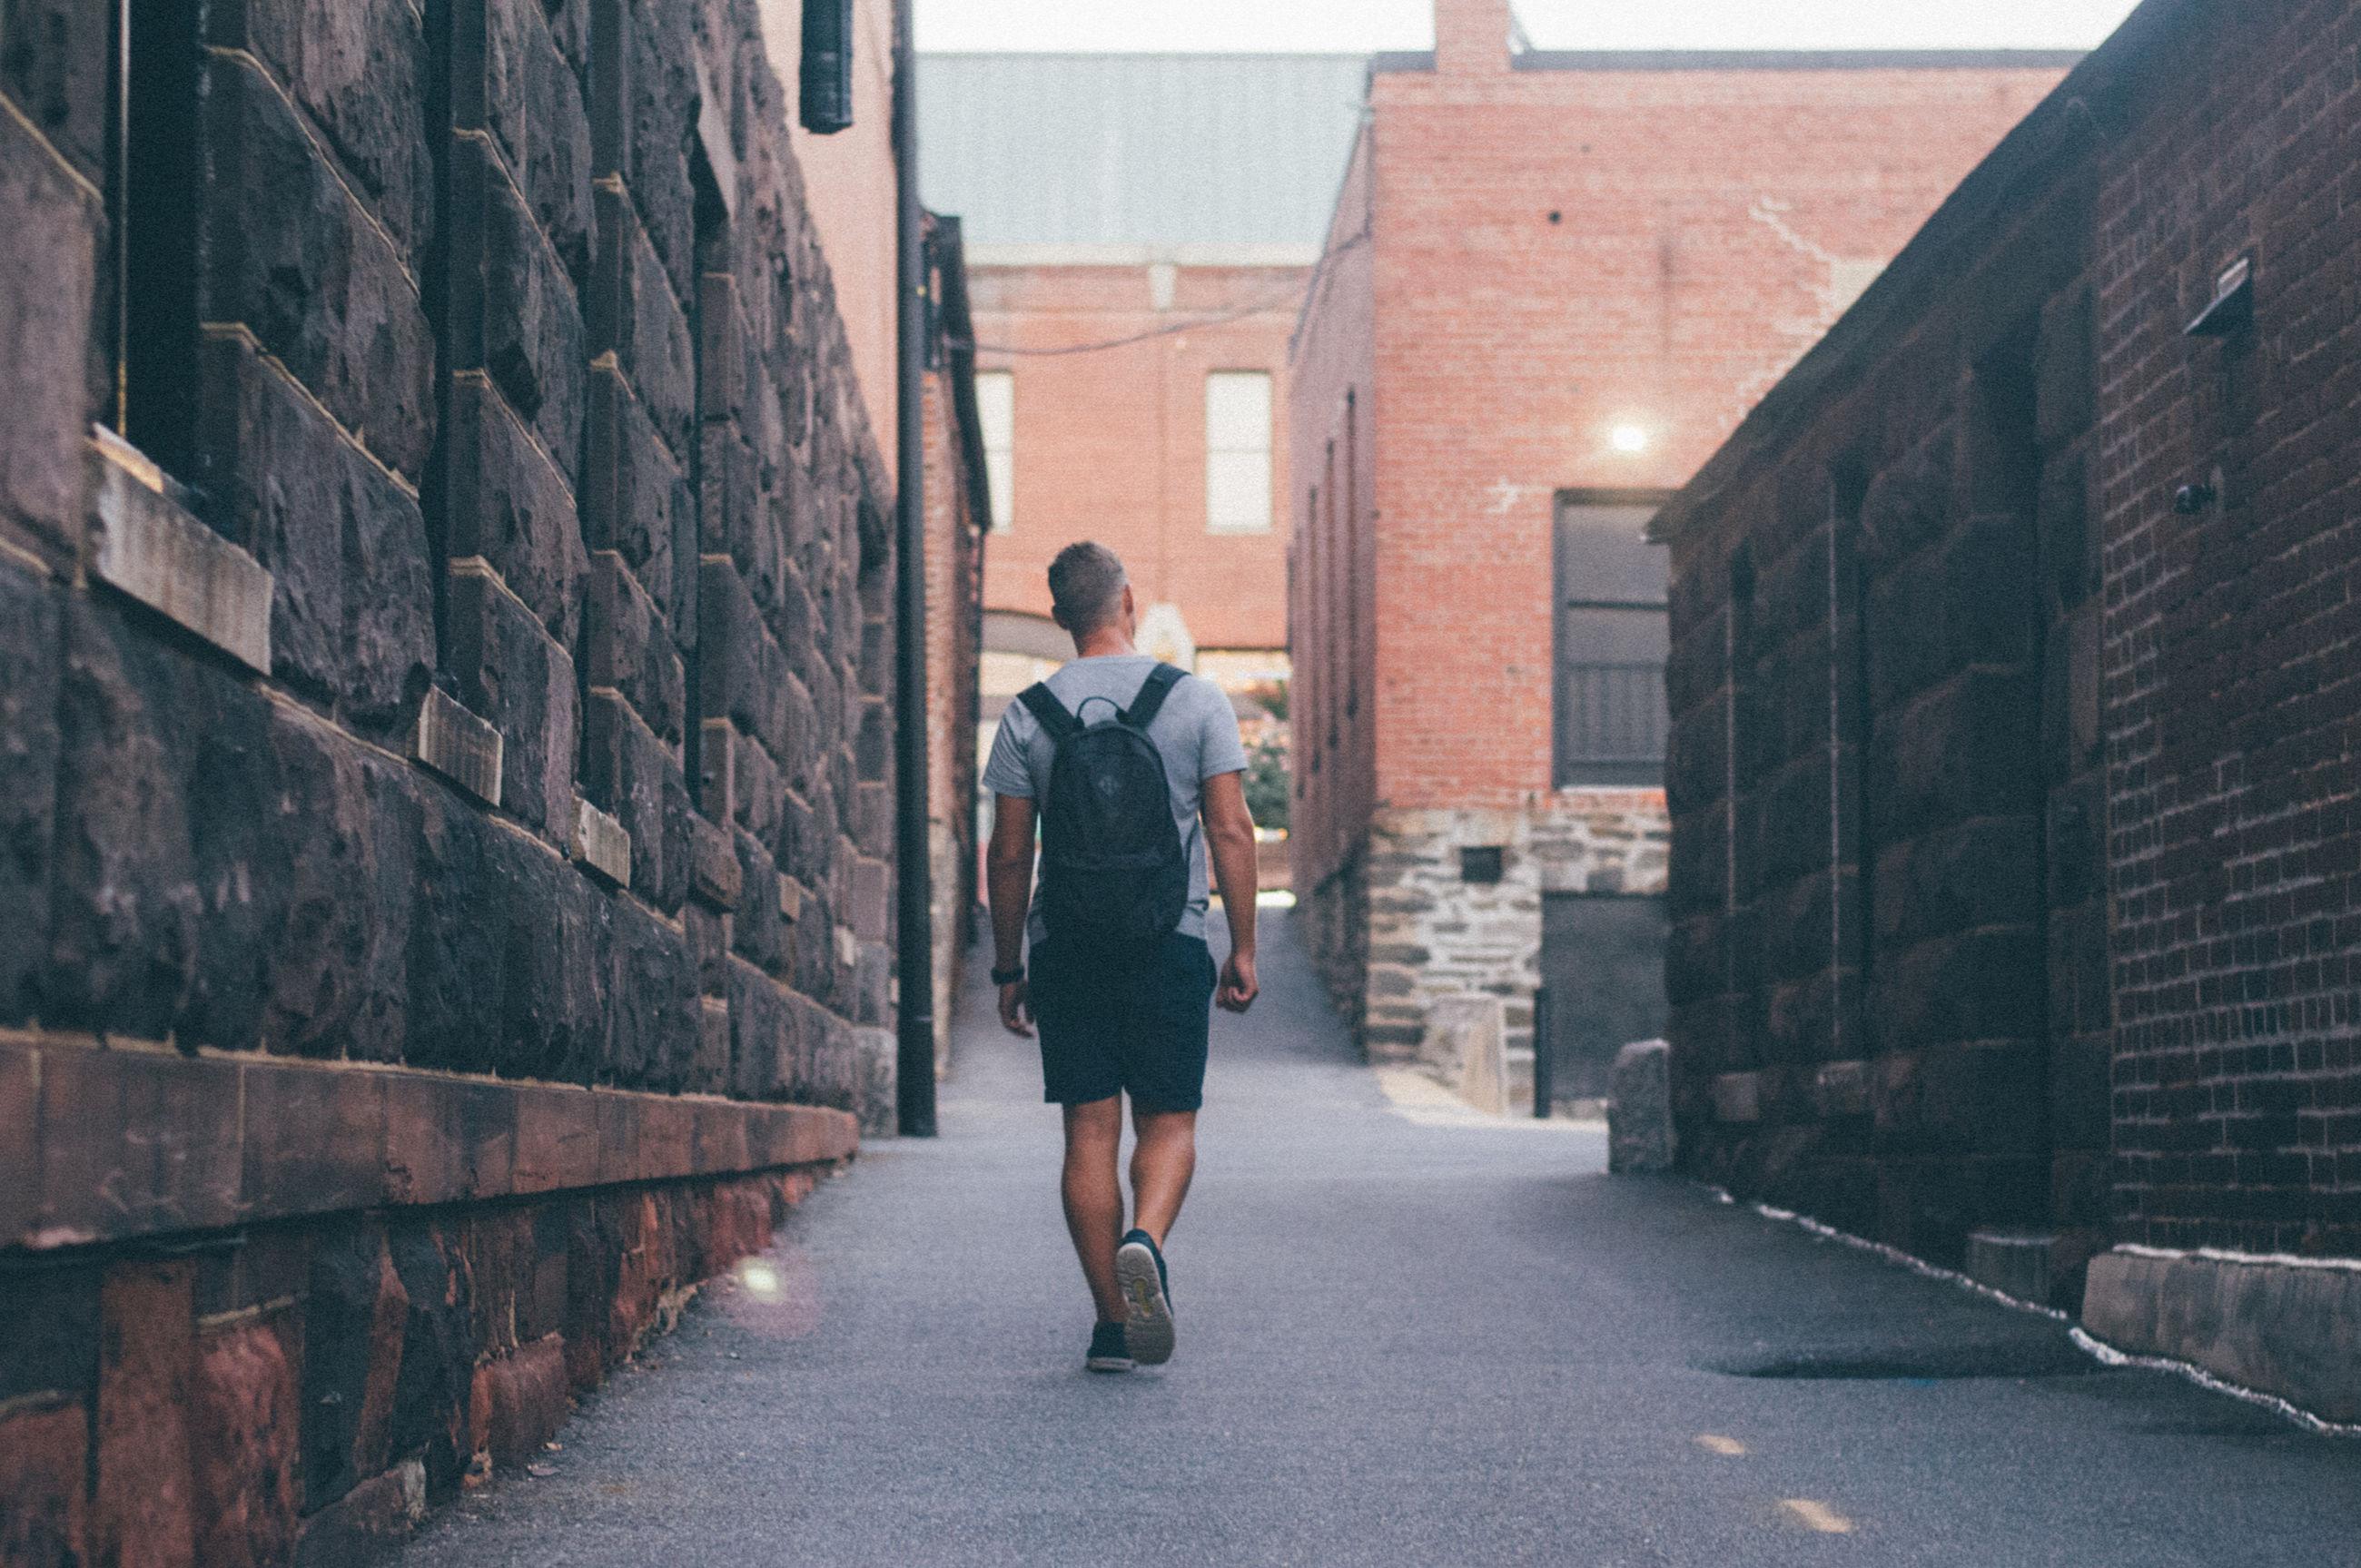 FULL LENGTH REAR VIEW OF MAN WALKING ON STREET AMIDST BUILDINGS